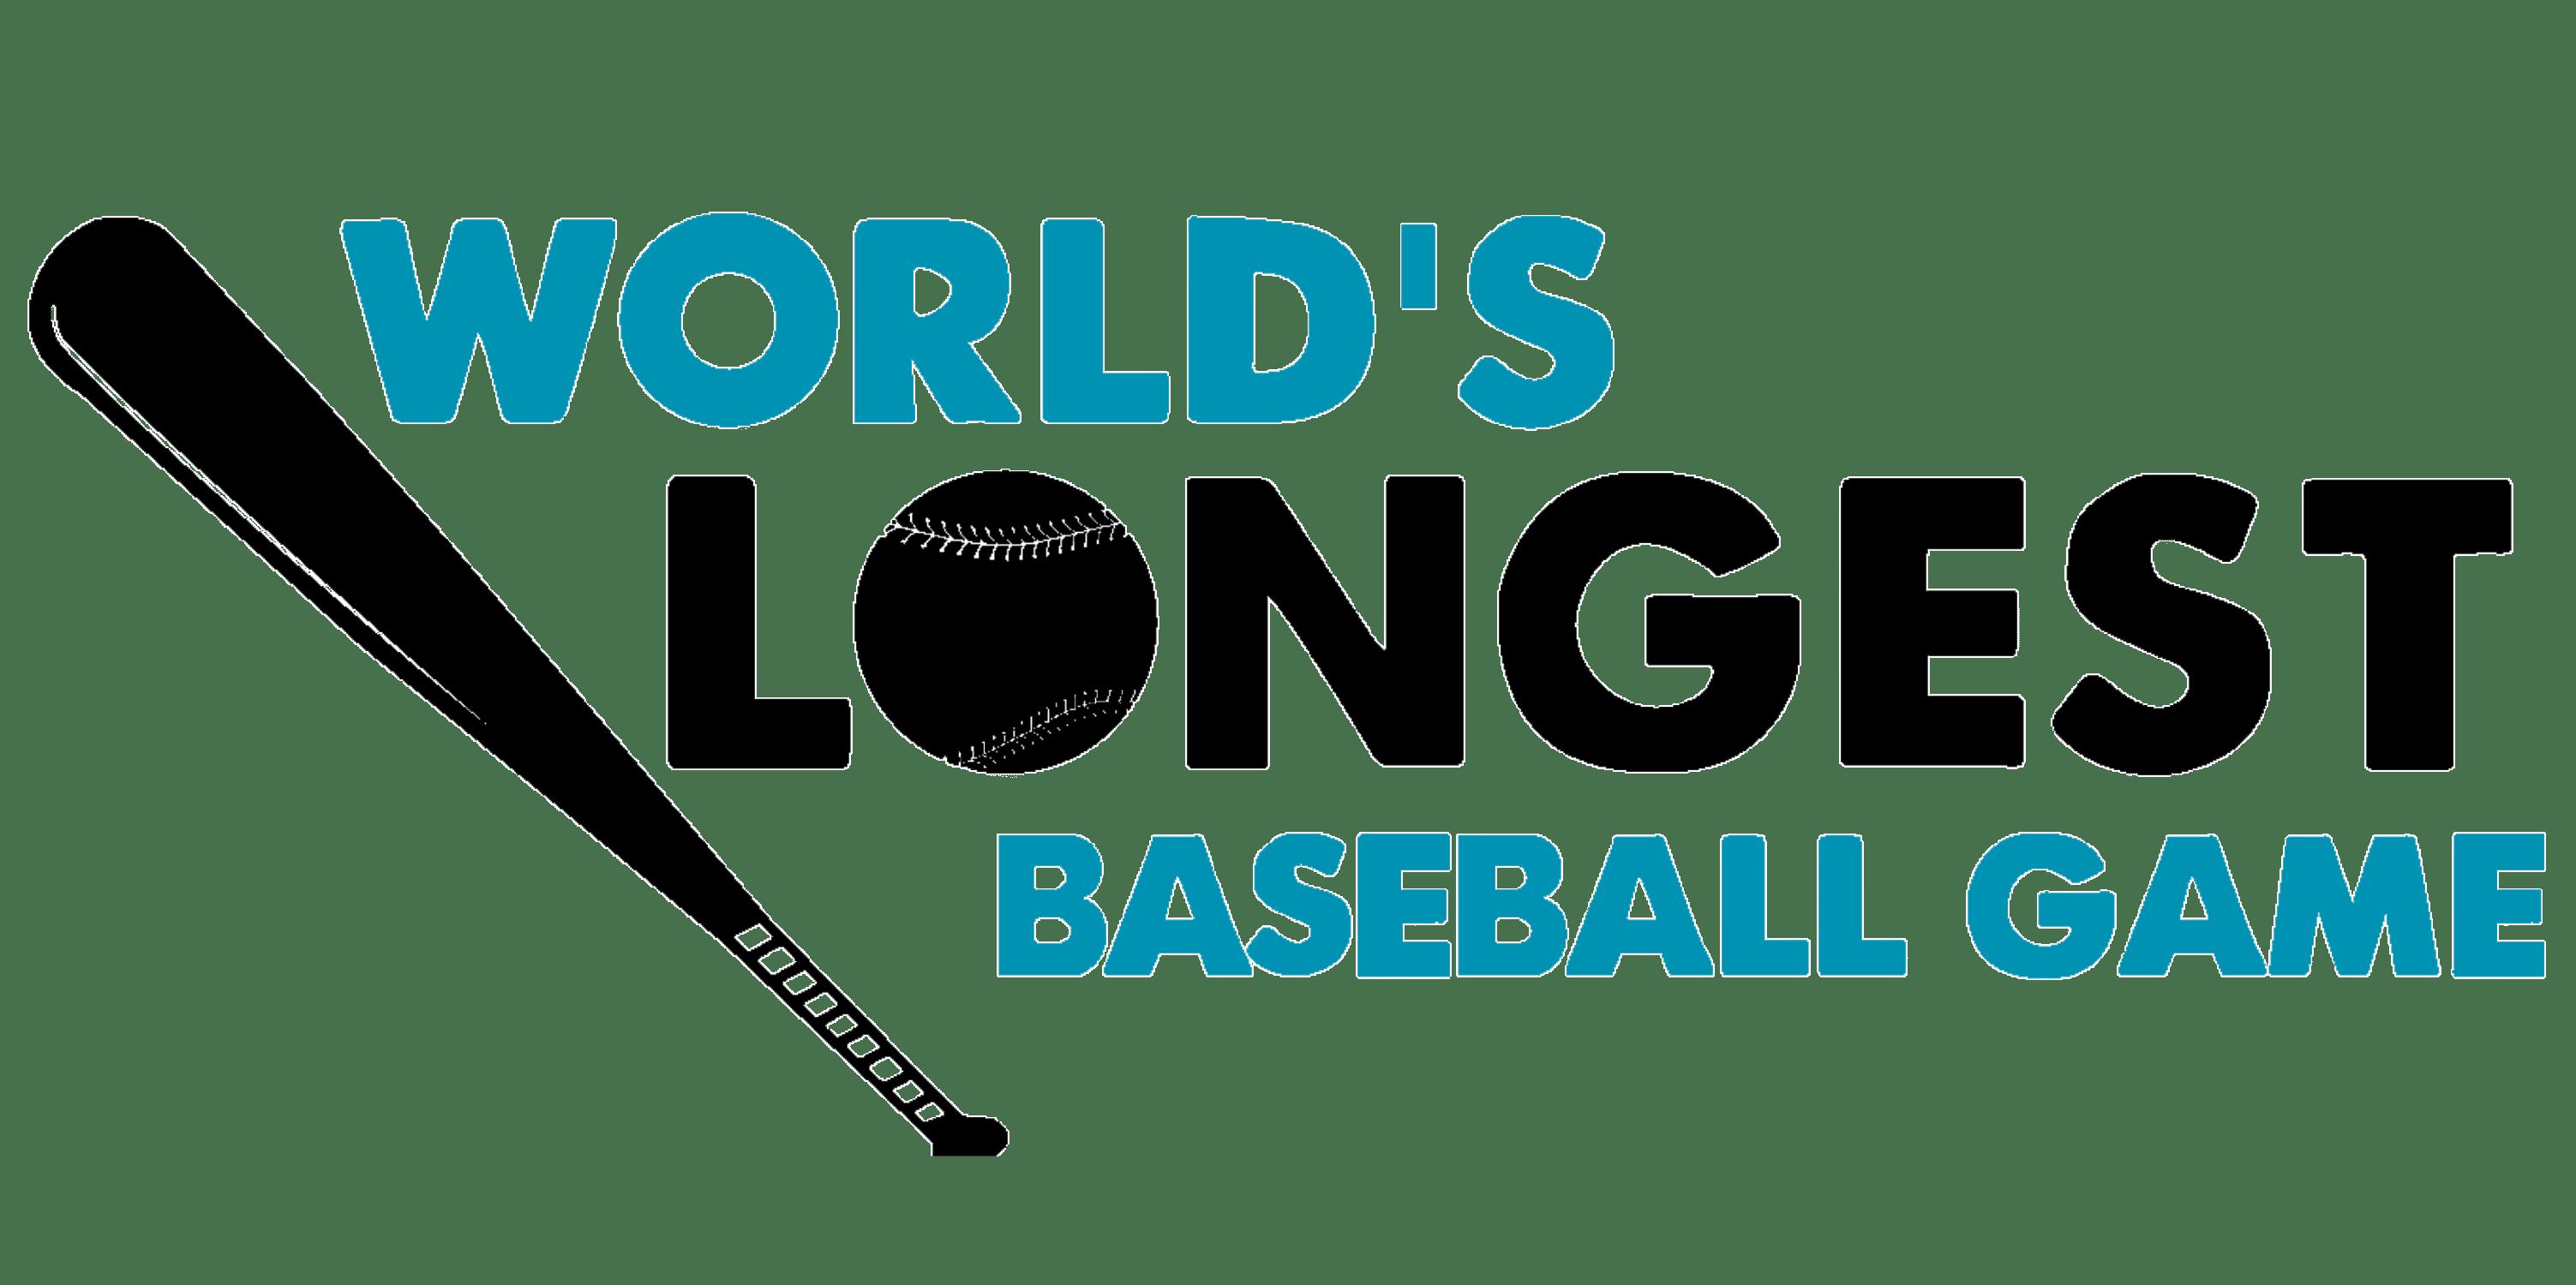 Worlds Longest Game